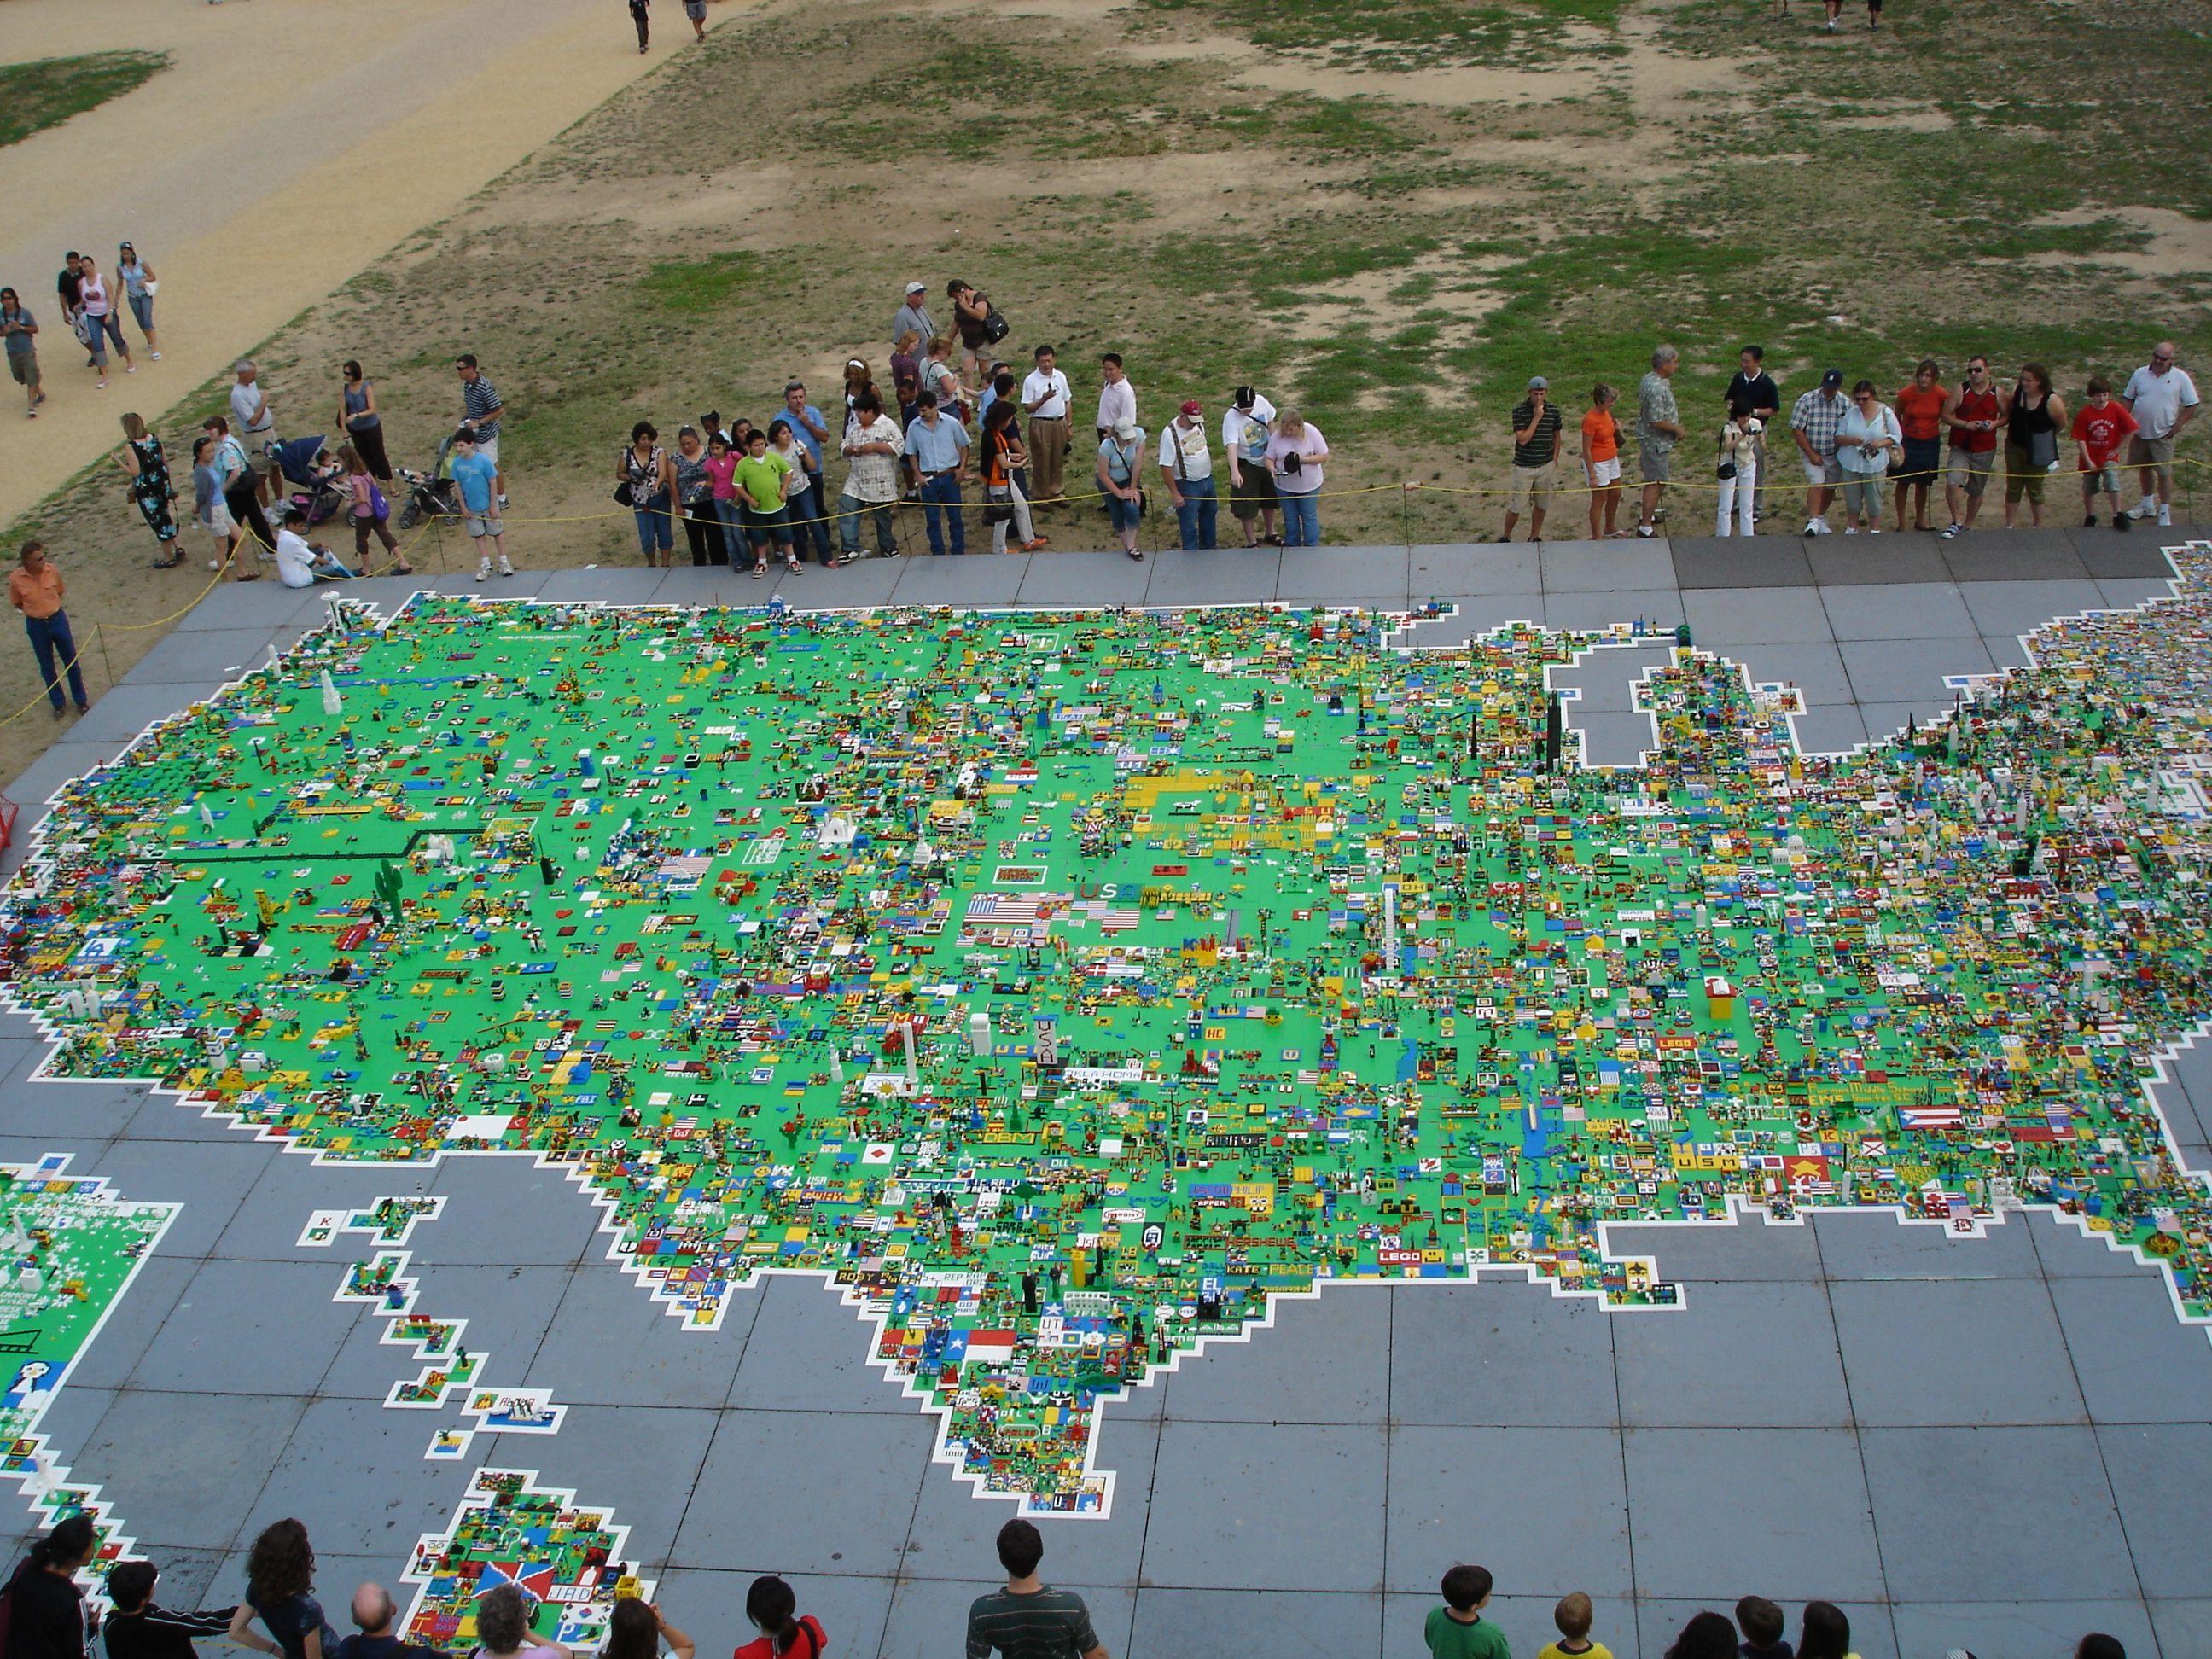 Gigantic Lego Map Of The United States Created During The World - Washington dc map conspiracy